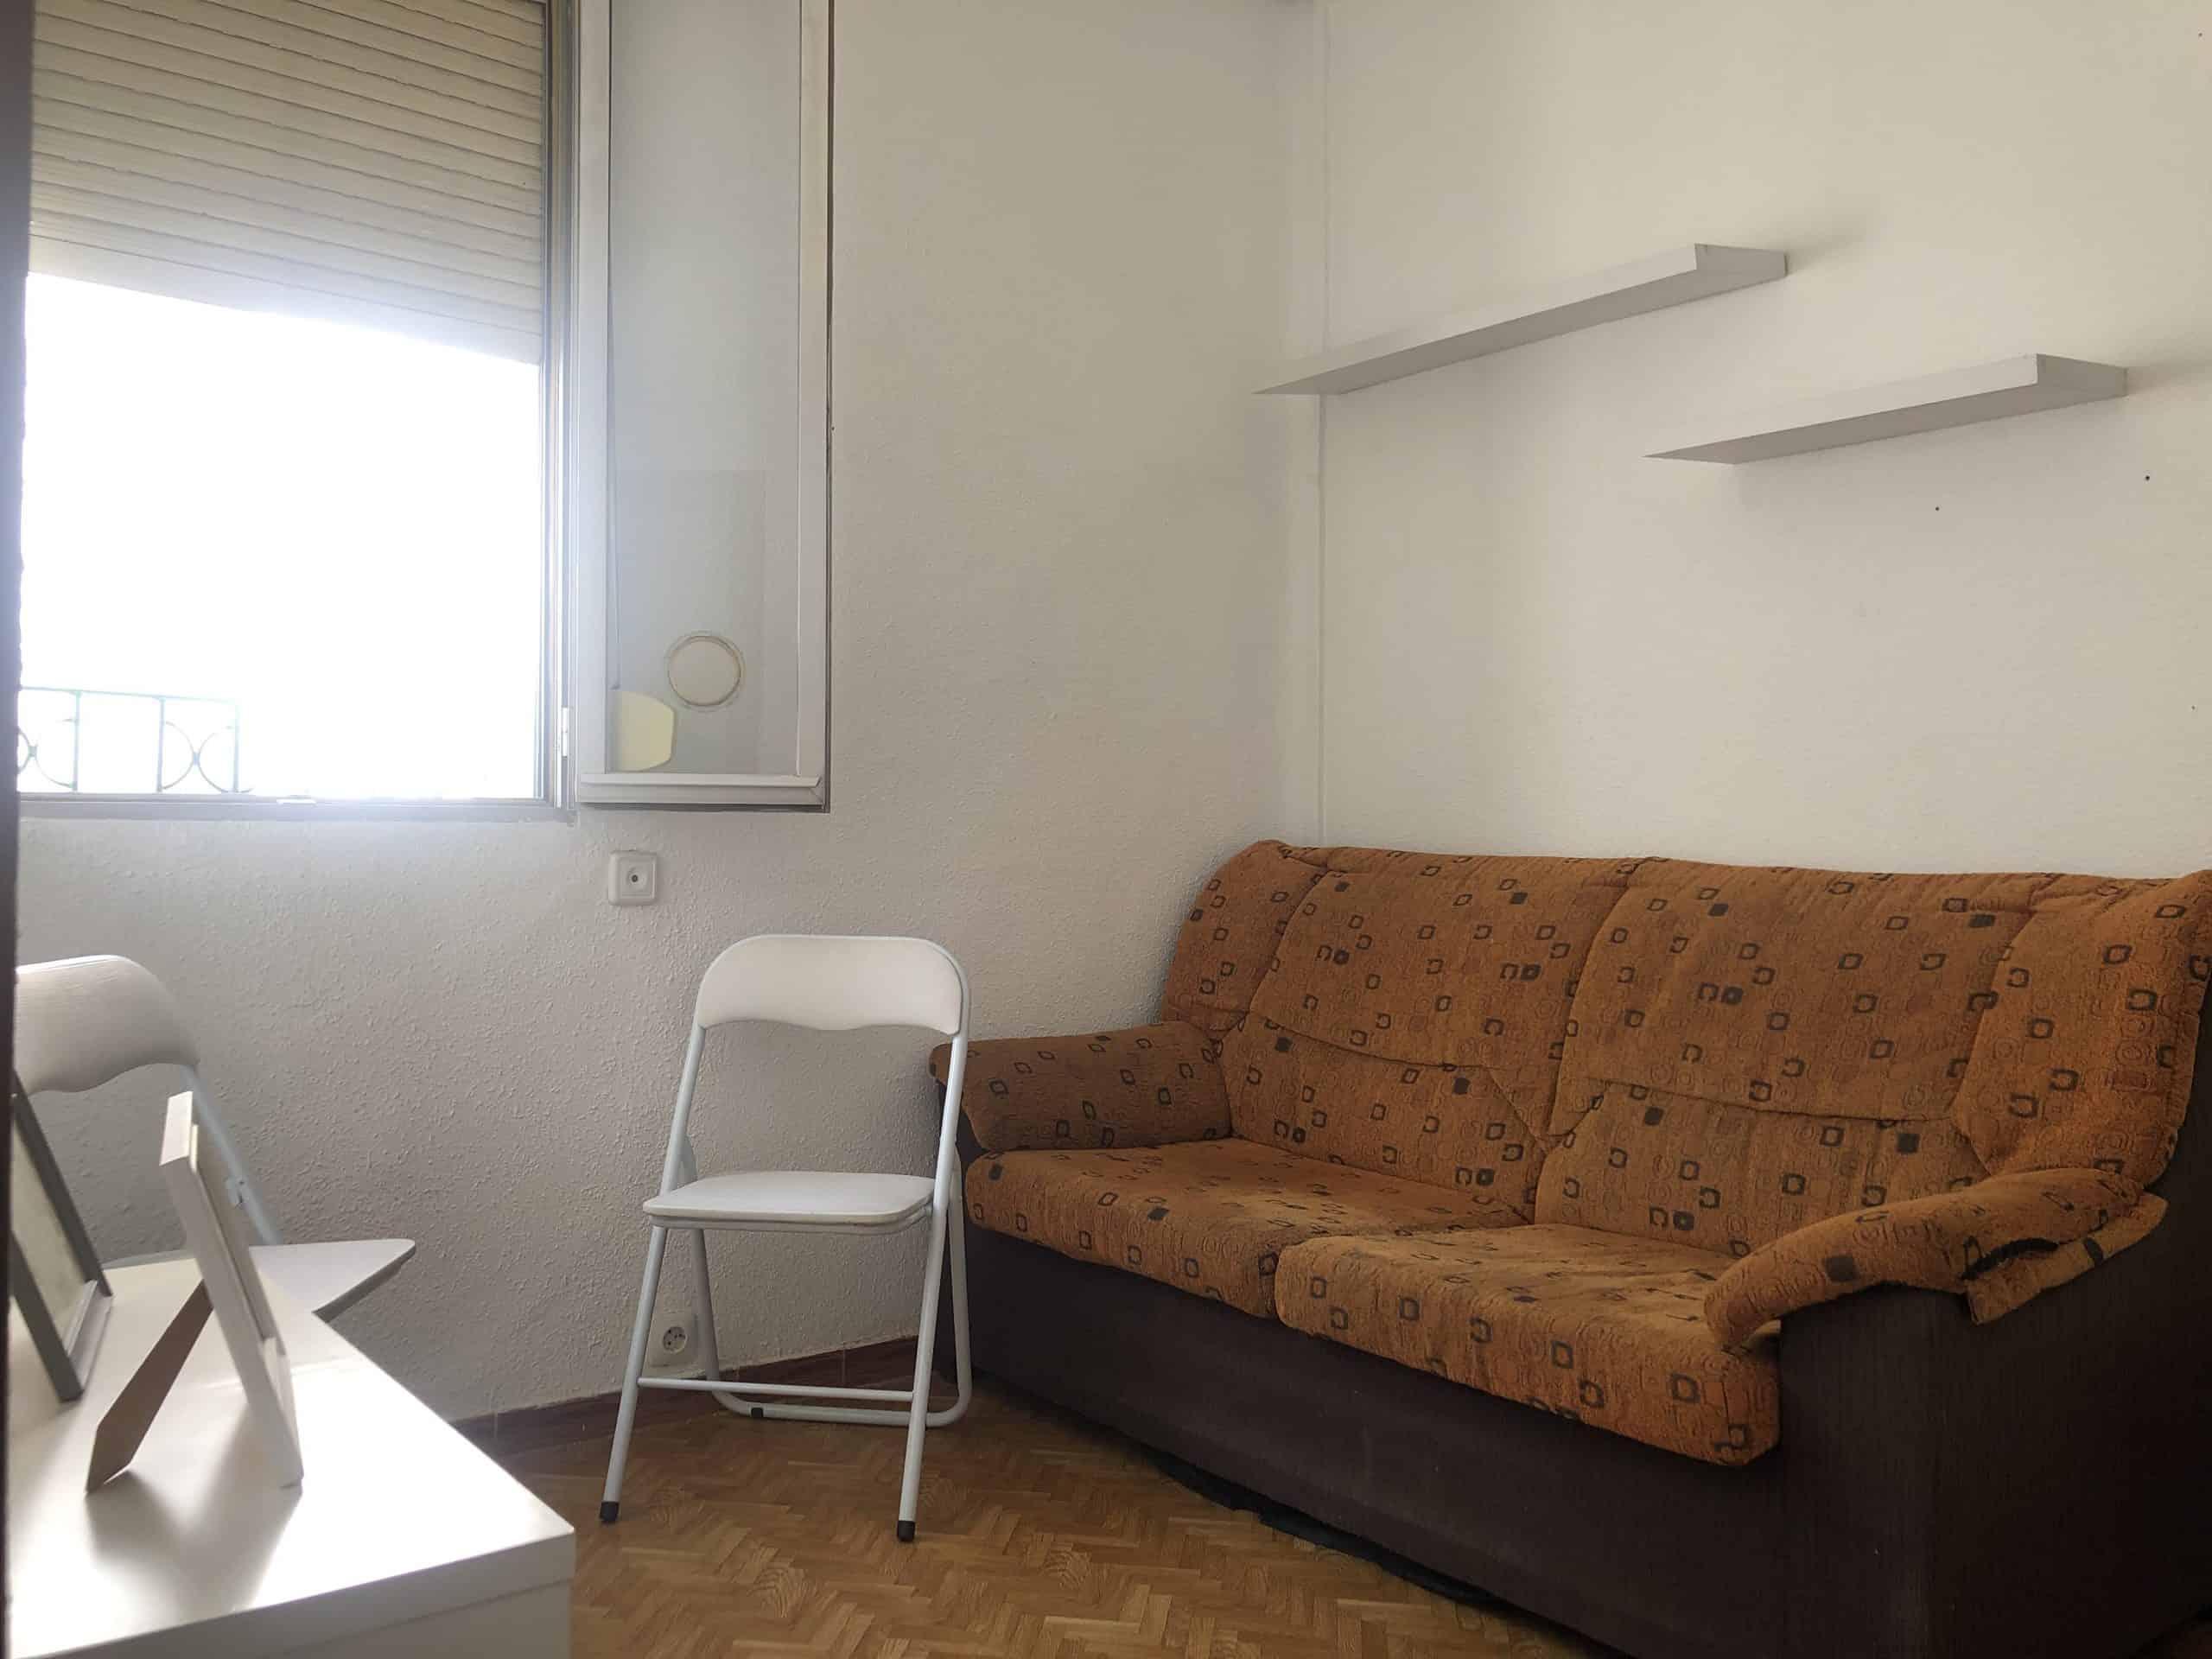 Agencia Inmobiliaria de Madrid-FUTUROCASA-Zona ARGANZUELA-EMBAJADORES-LEGAZPI -calle Embajadores- Salon